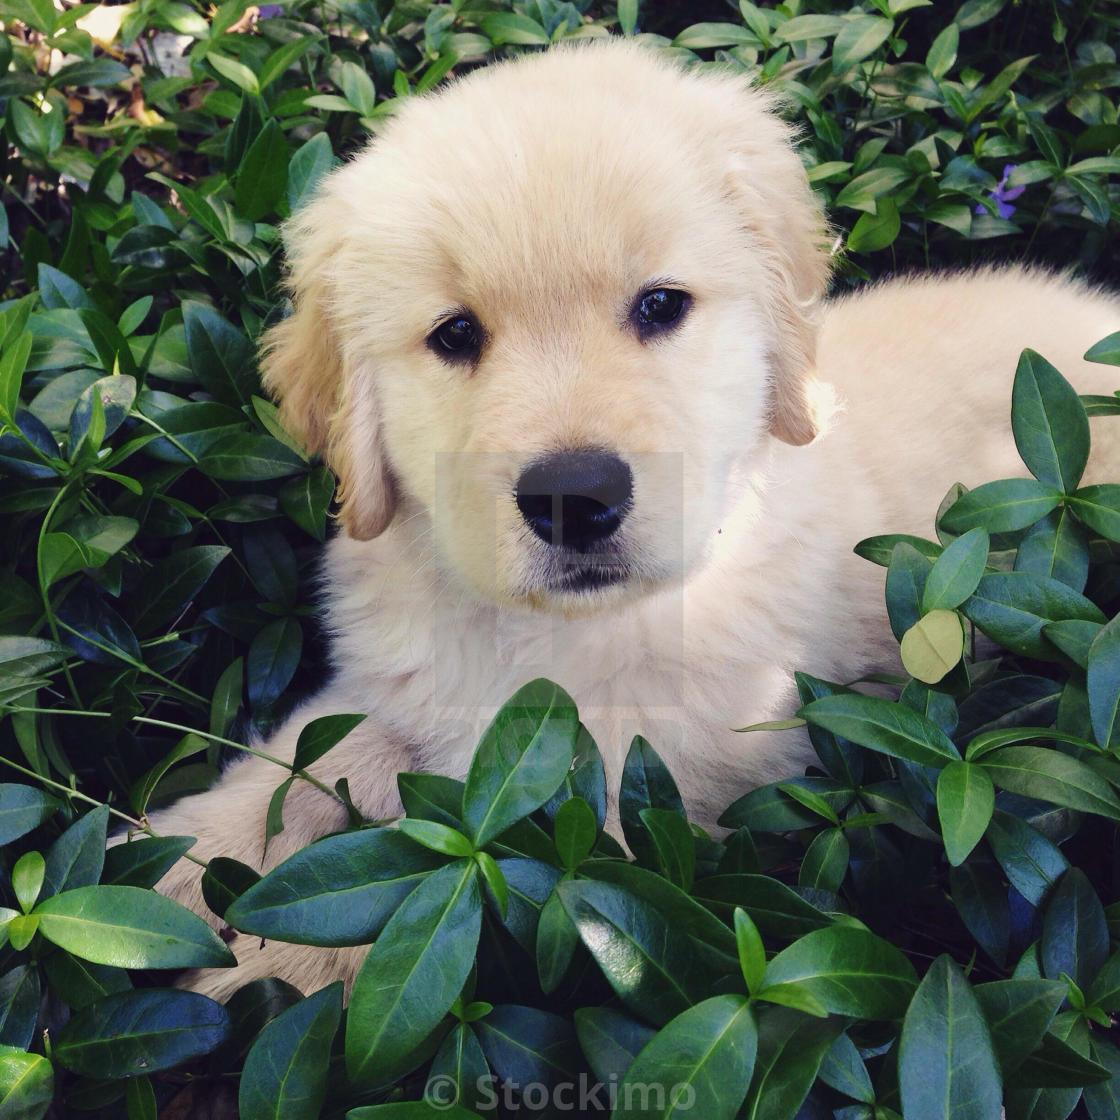 Golden Retriever Puppy License Download Or Print For 31 00 Photos Picfair